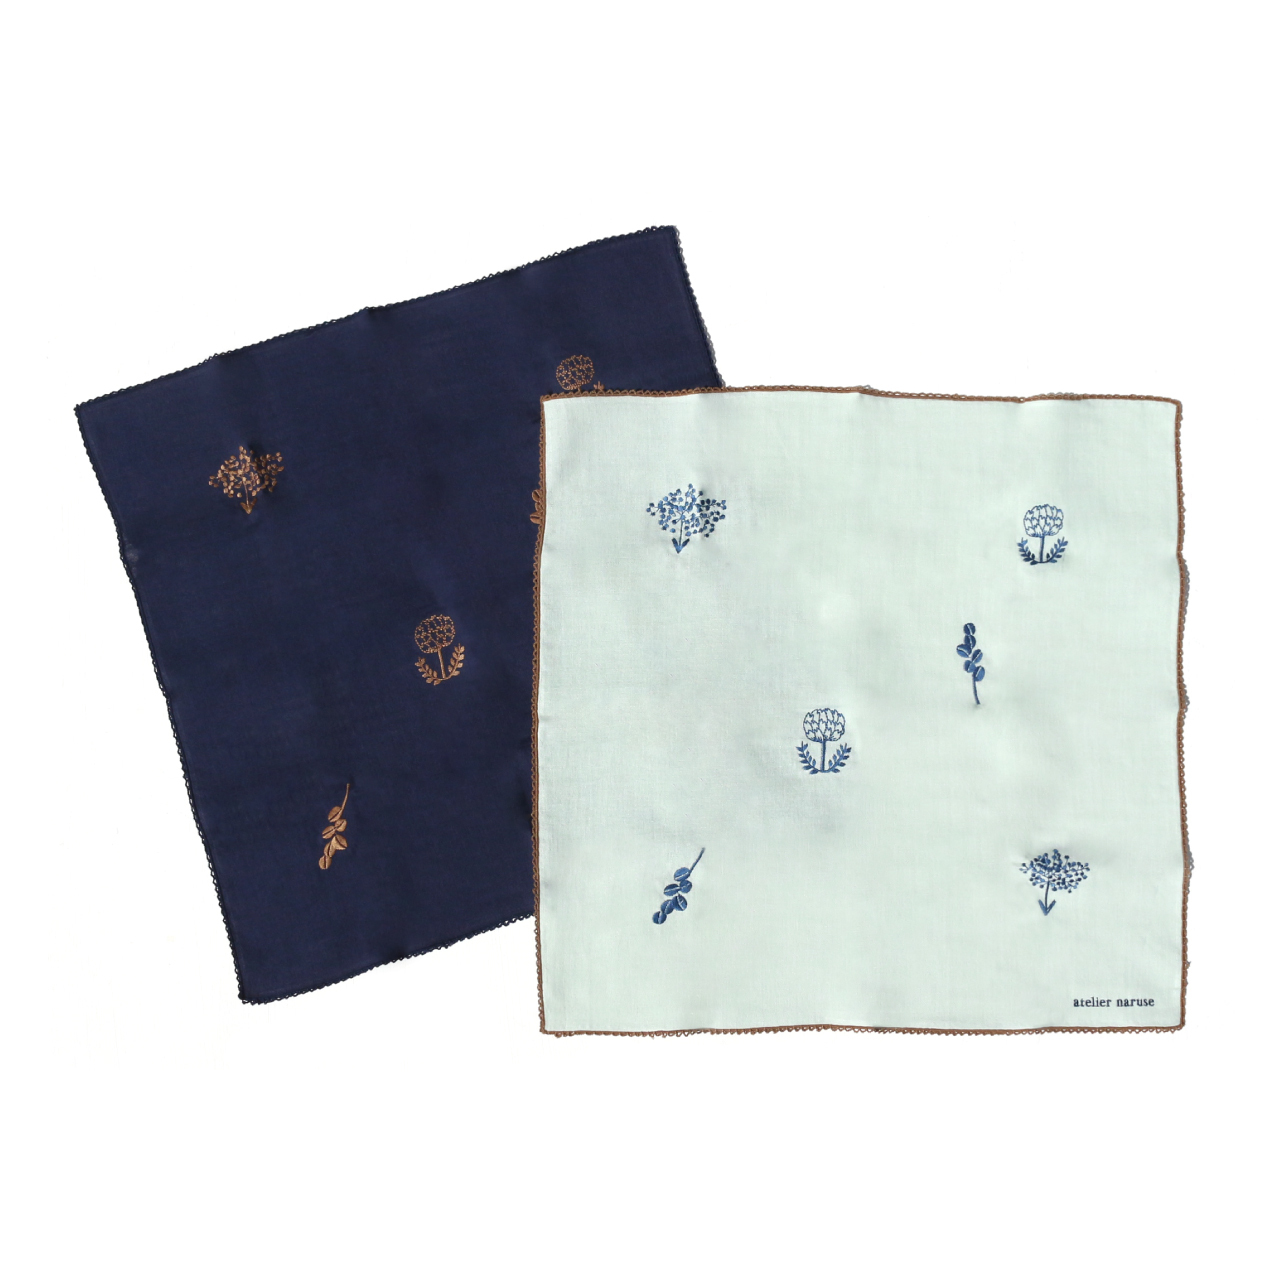 atelier naruse handkerchief 〜monotone flower〜 / アトリエナルセ ハンカチ 〜monotone flower〜